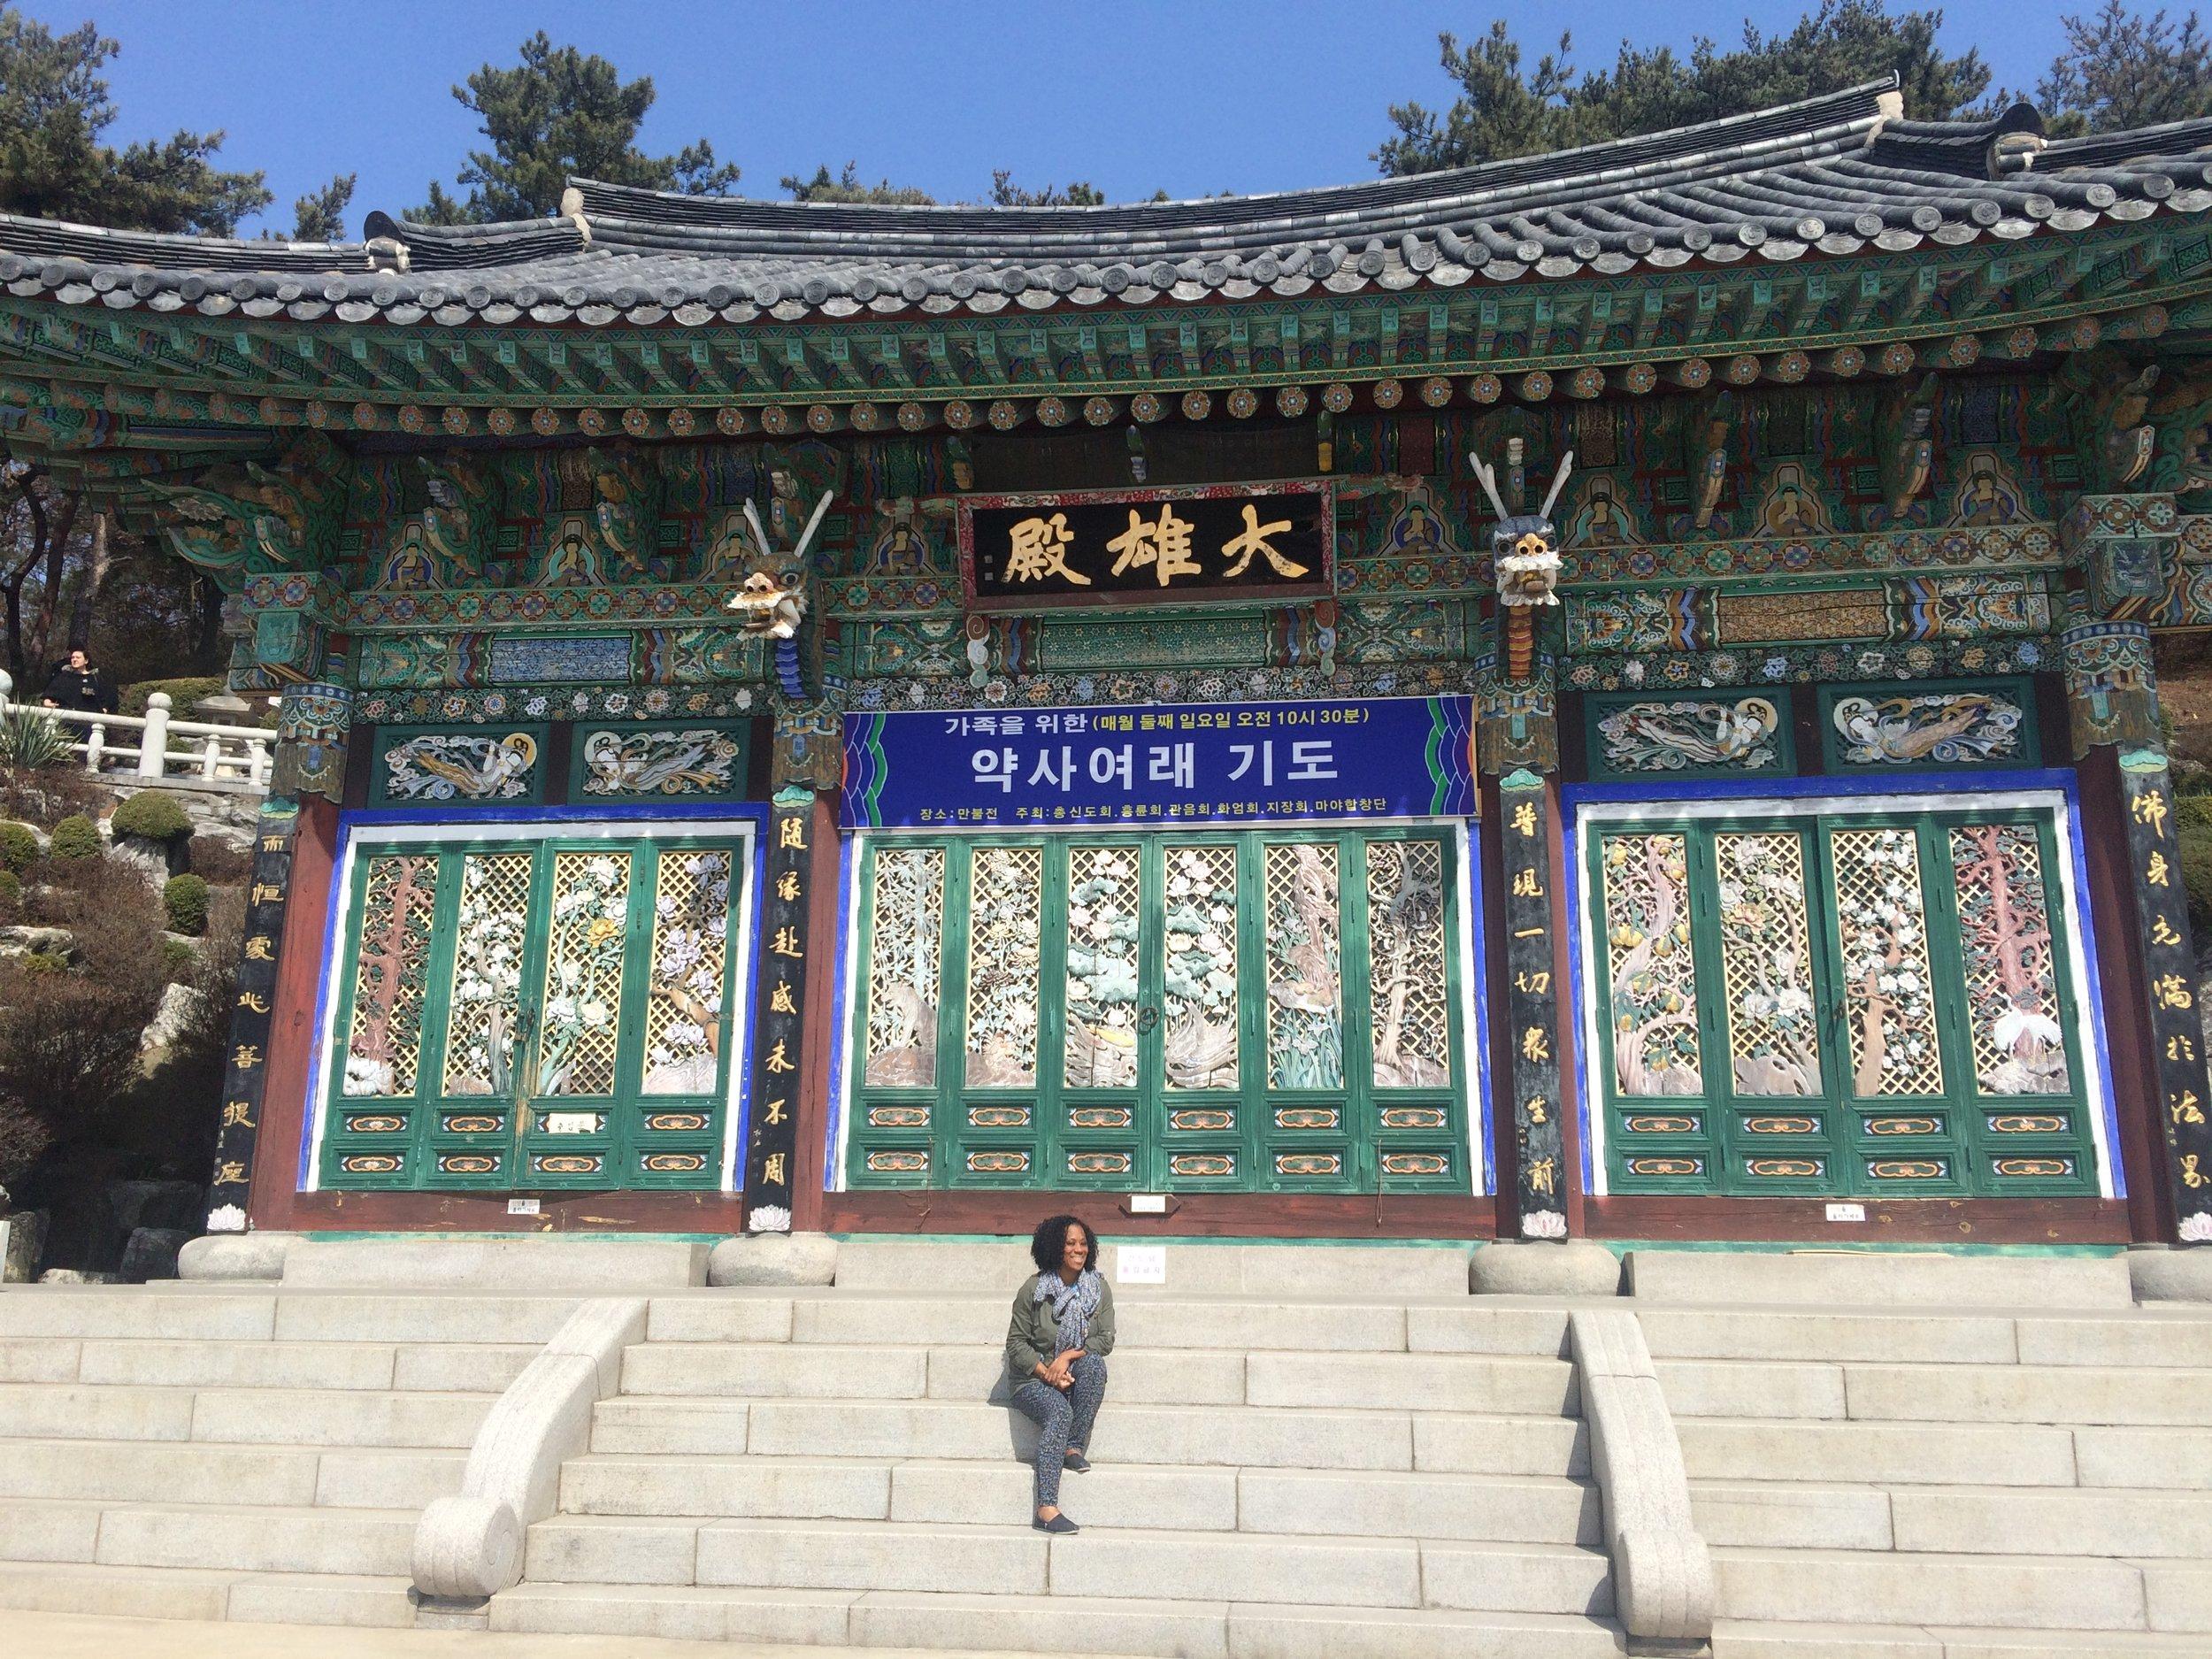 Dayka Robinson Bali Black Woman Solo International Black Woman Travel Ubud Incheon Seoul Korea-2 2016